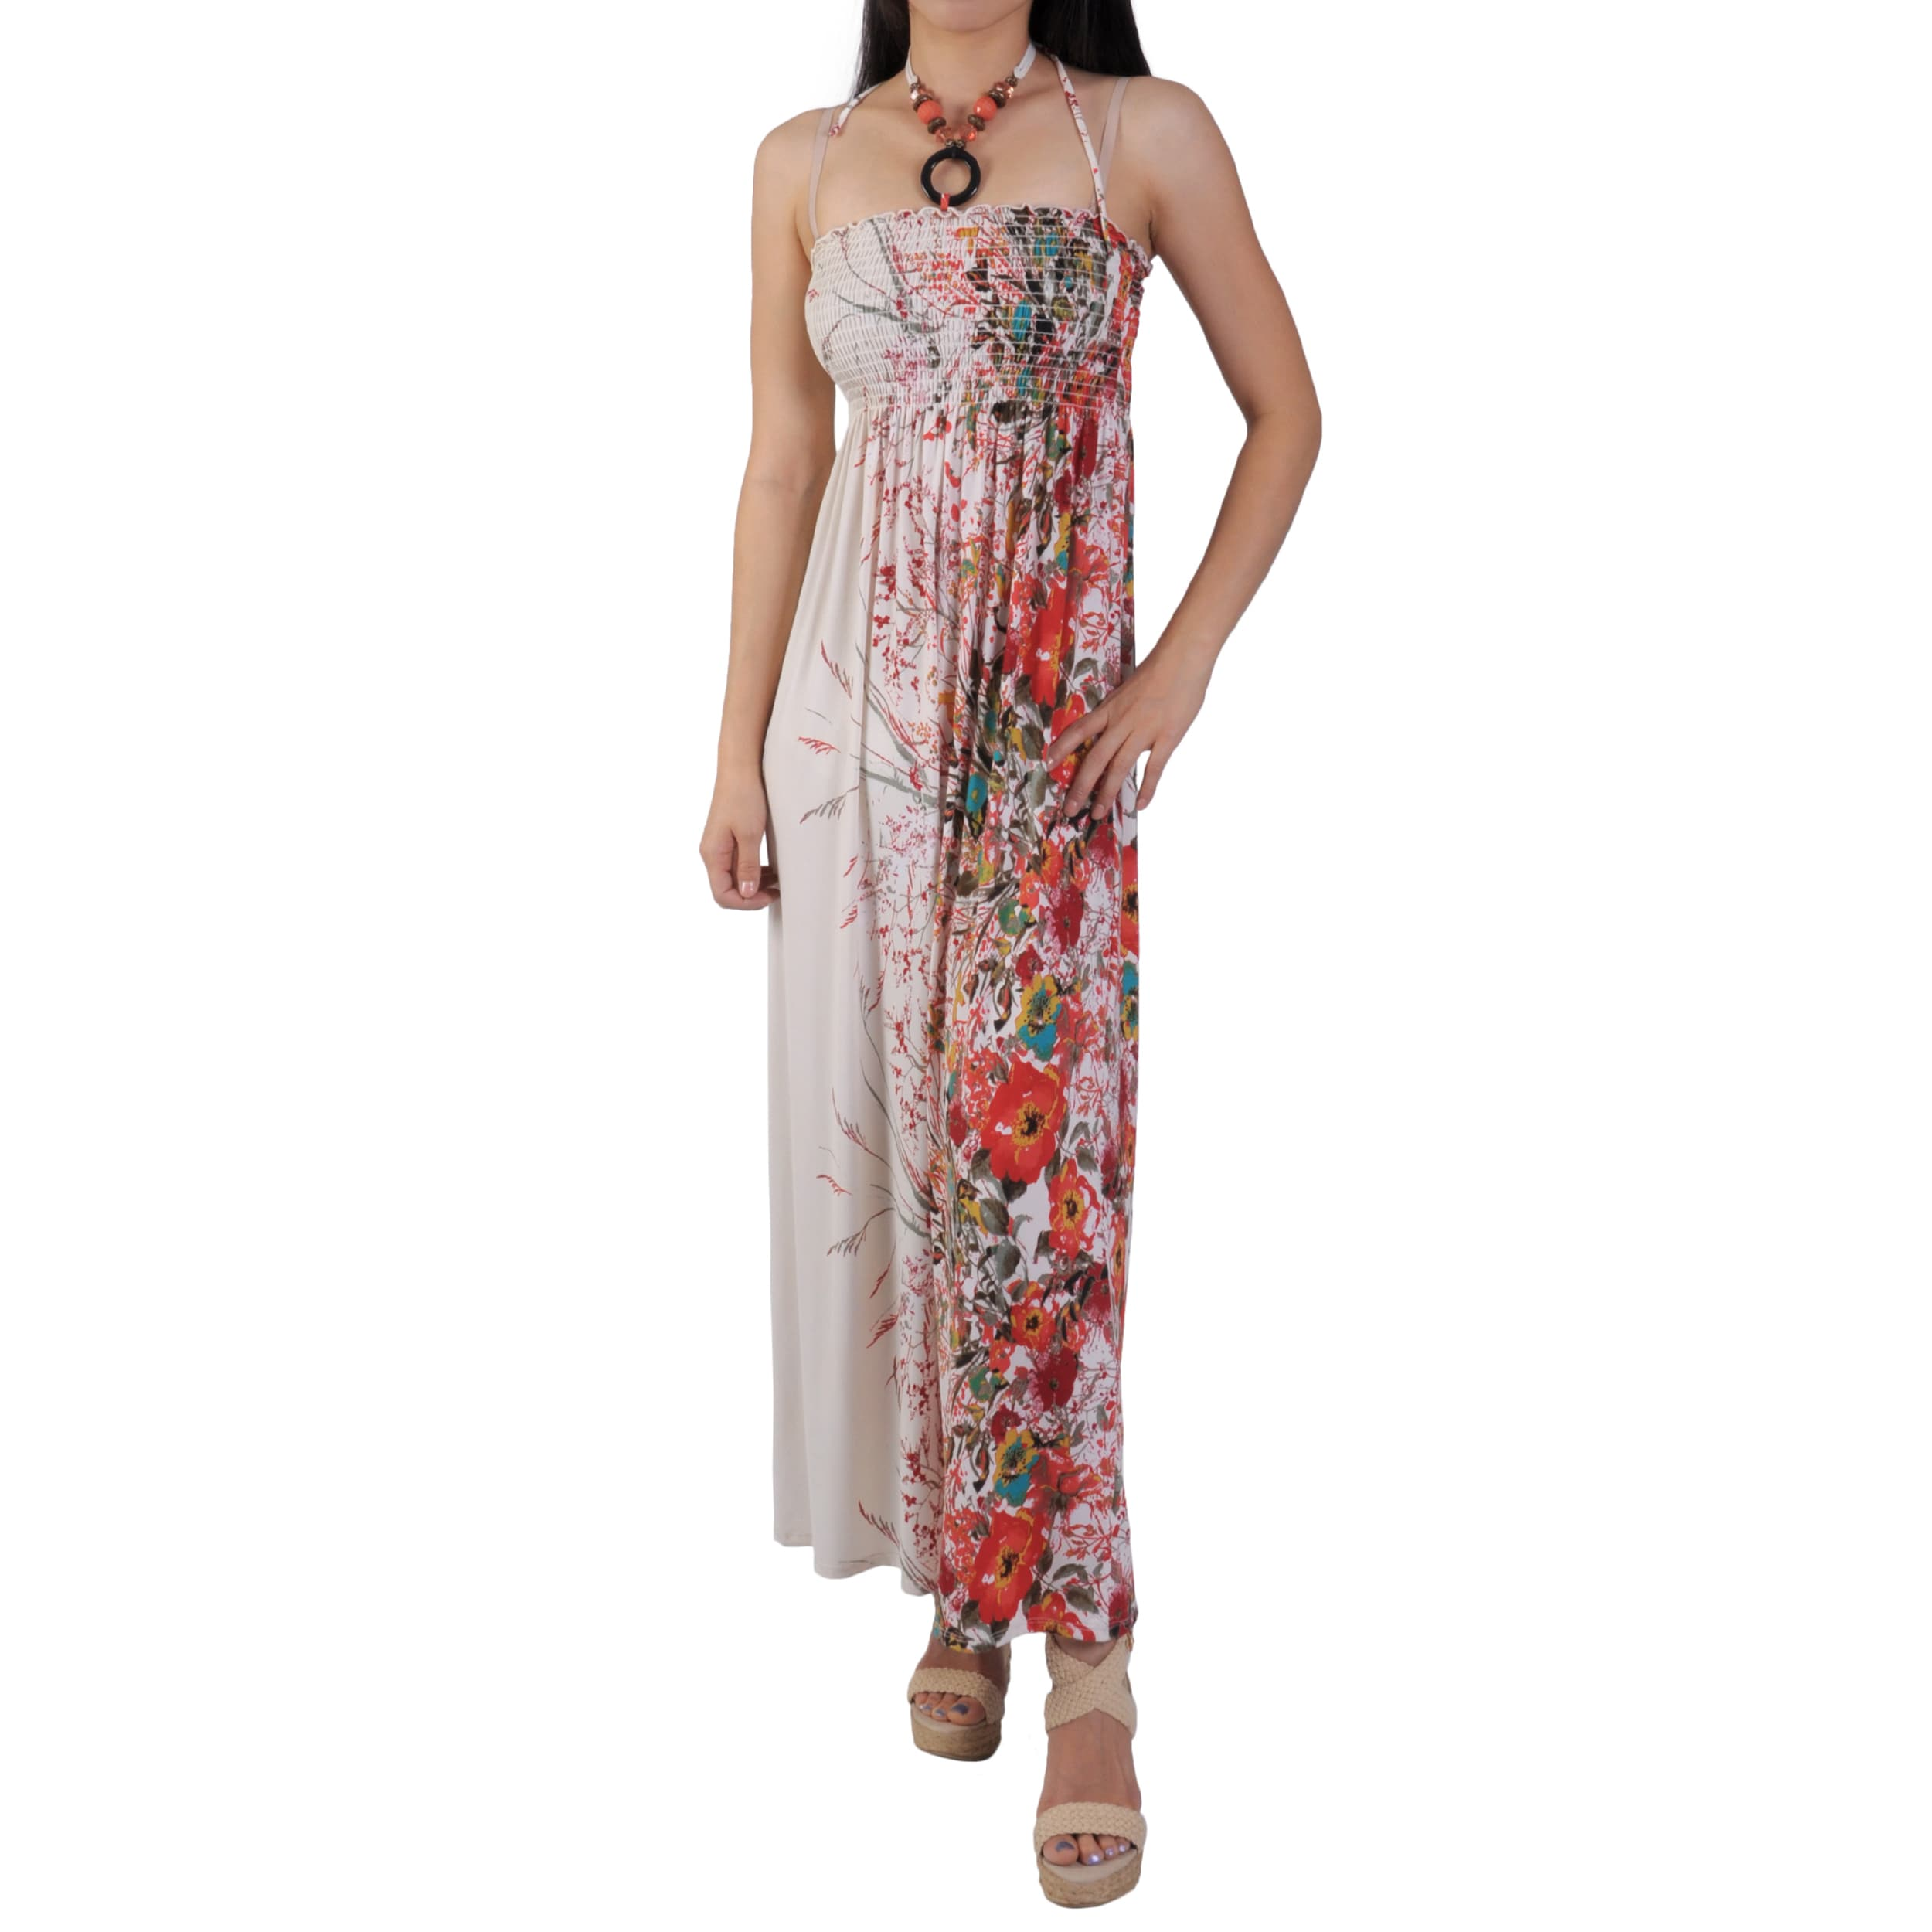 Ci Sono by Journee Juniors Floral Print Smocked Halter Top Sundress